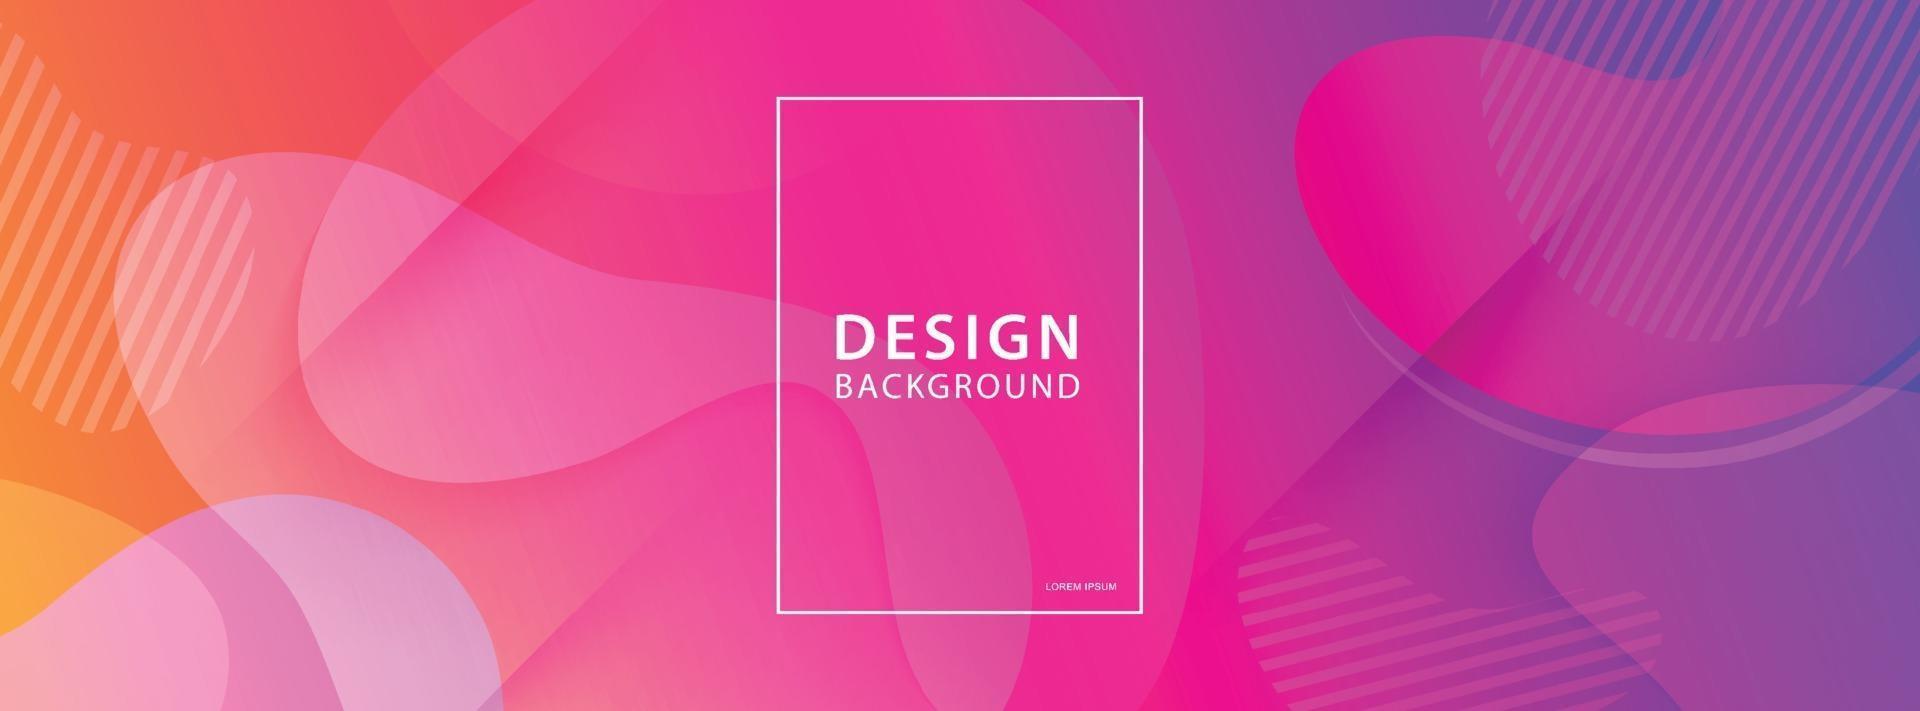 vloeiende vorm banner ontwerp achtergrond. vloeibare geometrische gradiëntsjabloon. vector